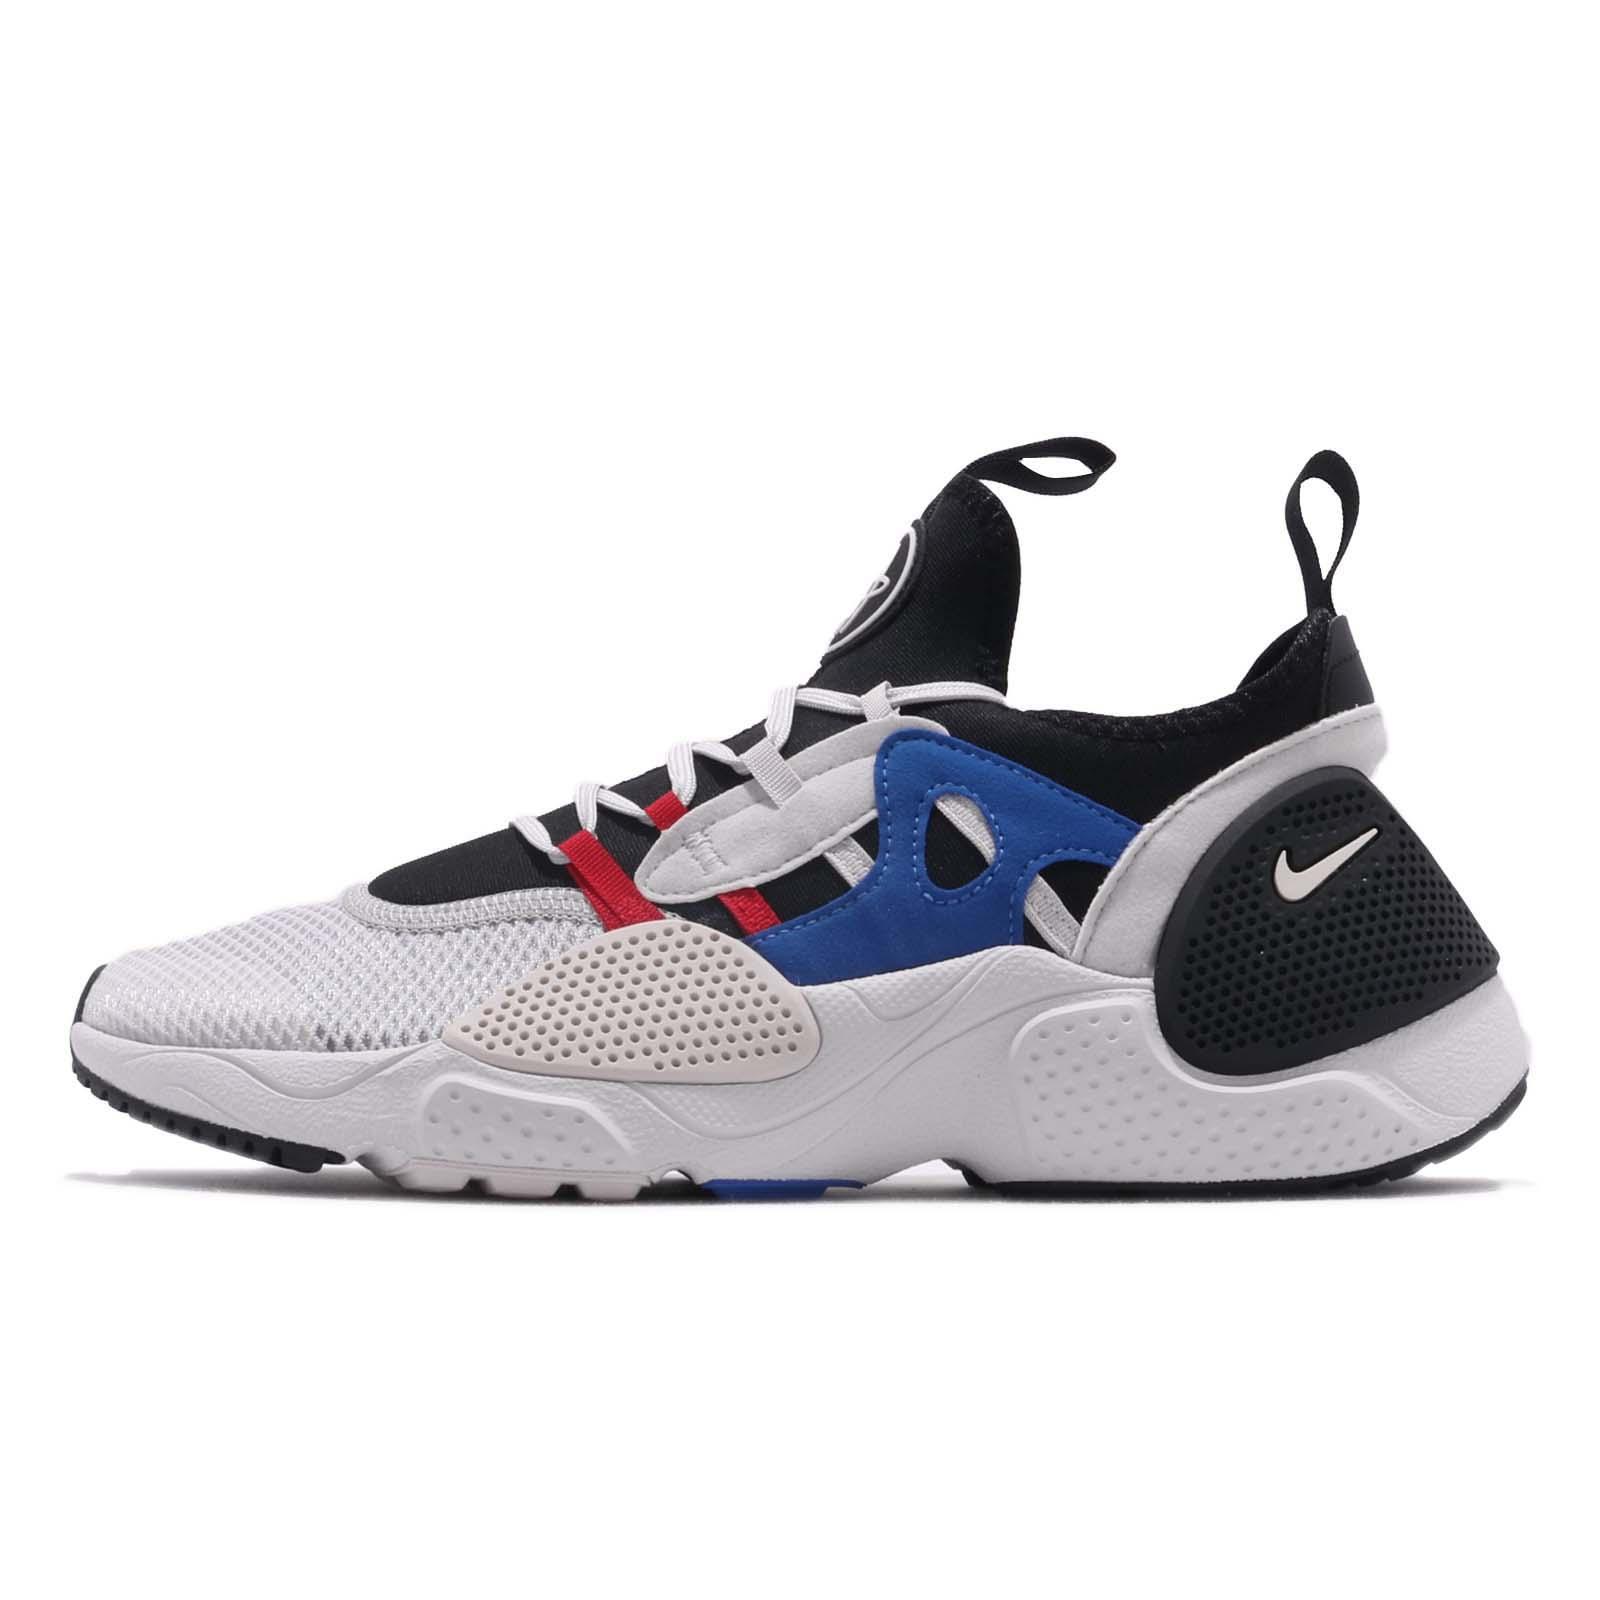 the best attitude 4e5df 080ef Details about Nike Huarache E.D.G.E. Txt Black Grey Game Royal Red Men Shoe  Sneaker AO1697-001